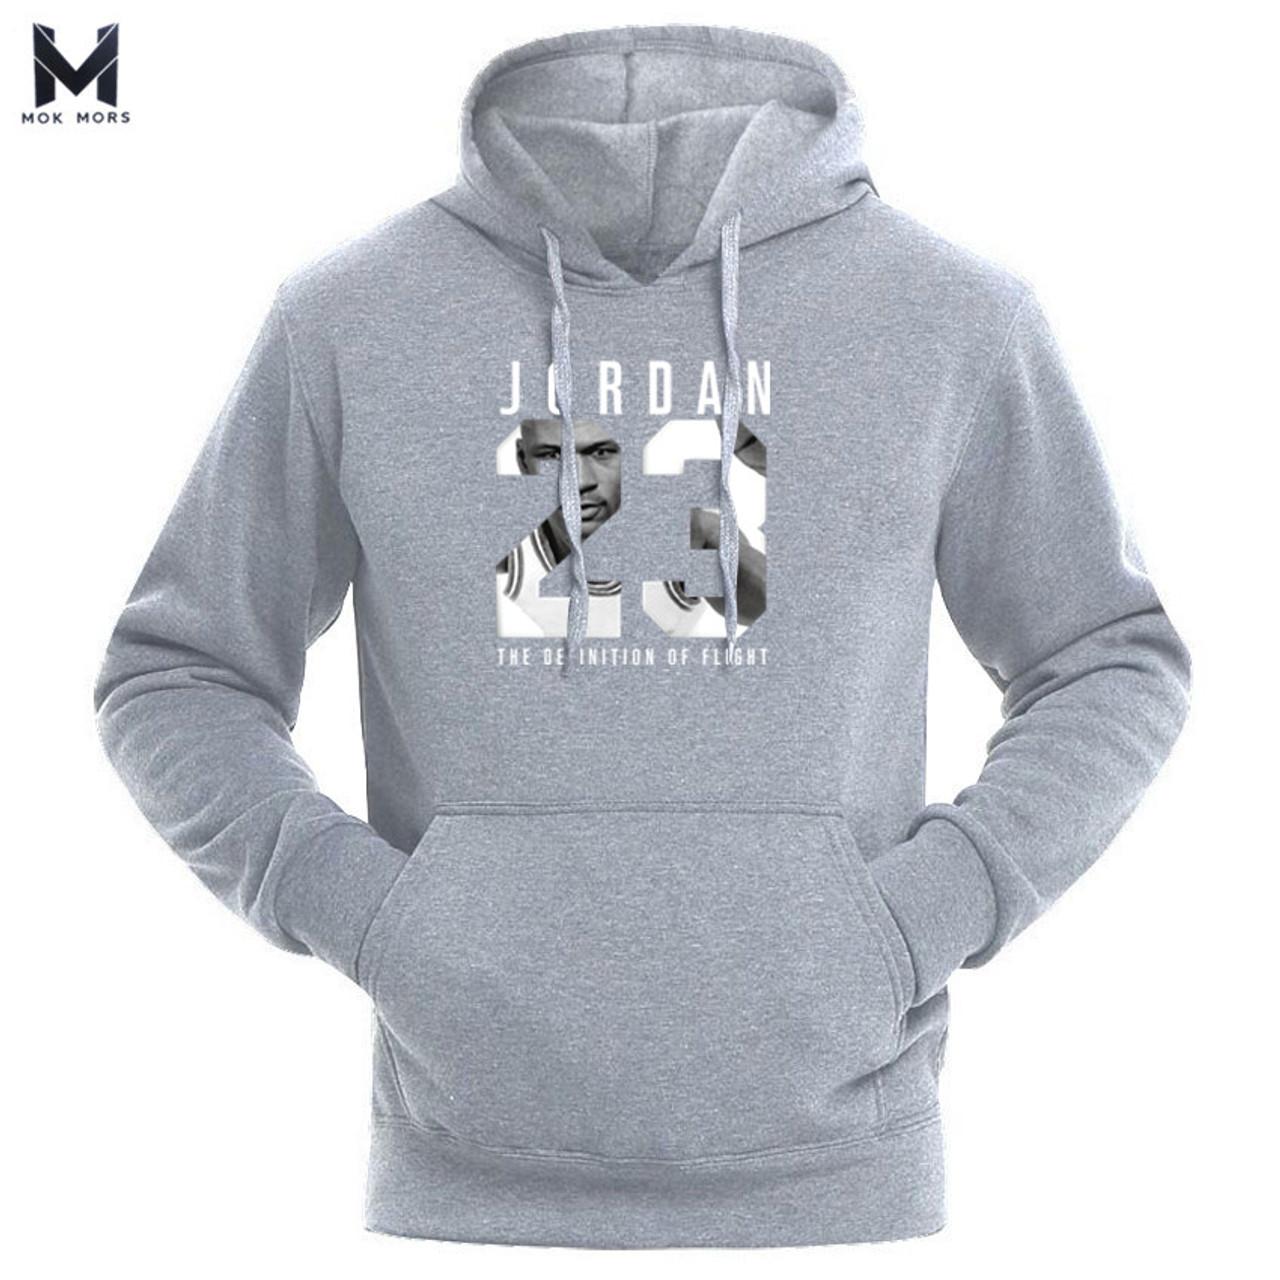 c4a4f8c3 2018 Brand JORDAN 23 Men Sportswear Fashion brand Print Mens hoodies  Pullover Hip Hop Mens tracksuit ...